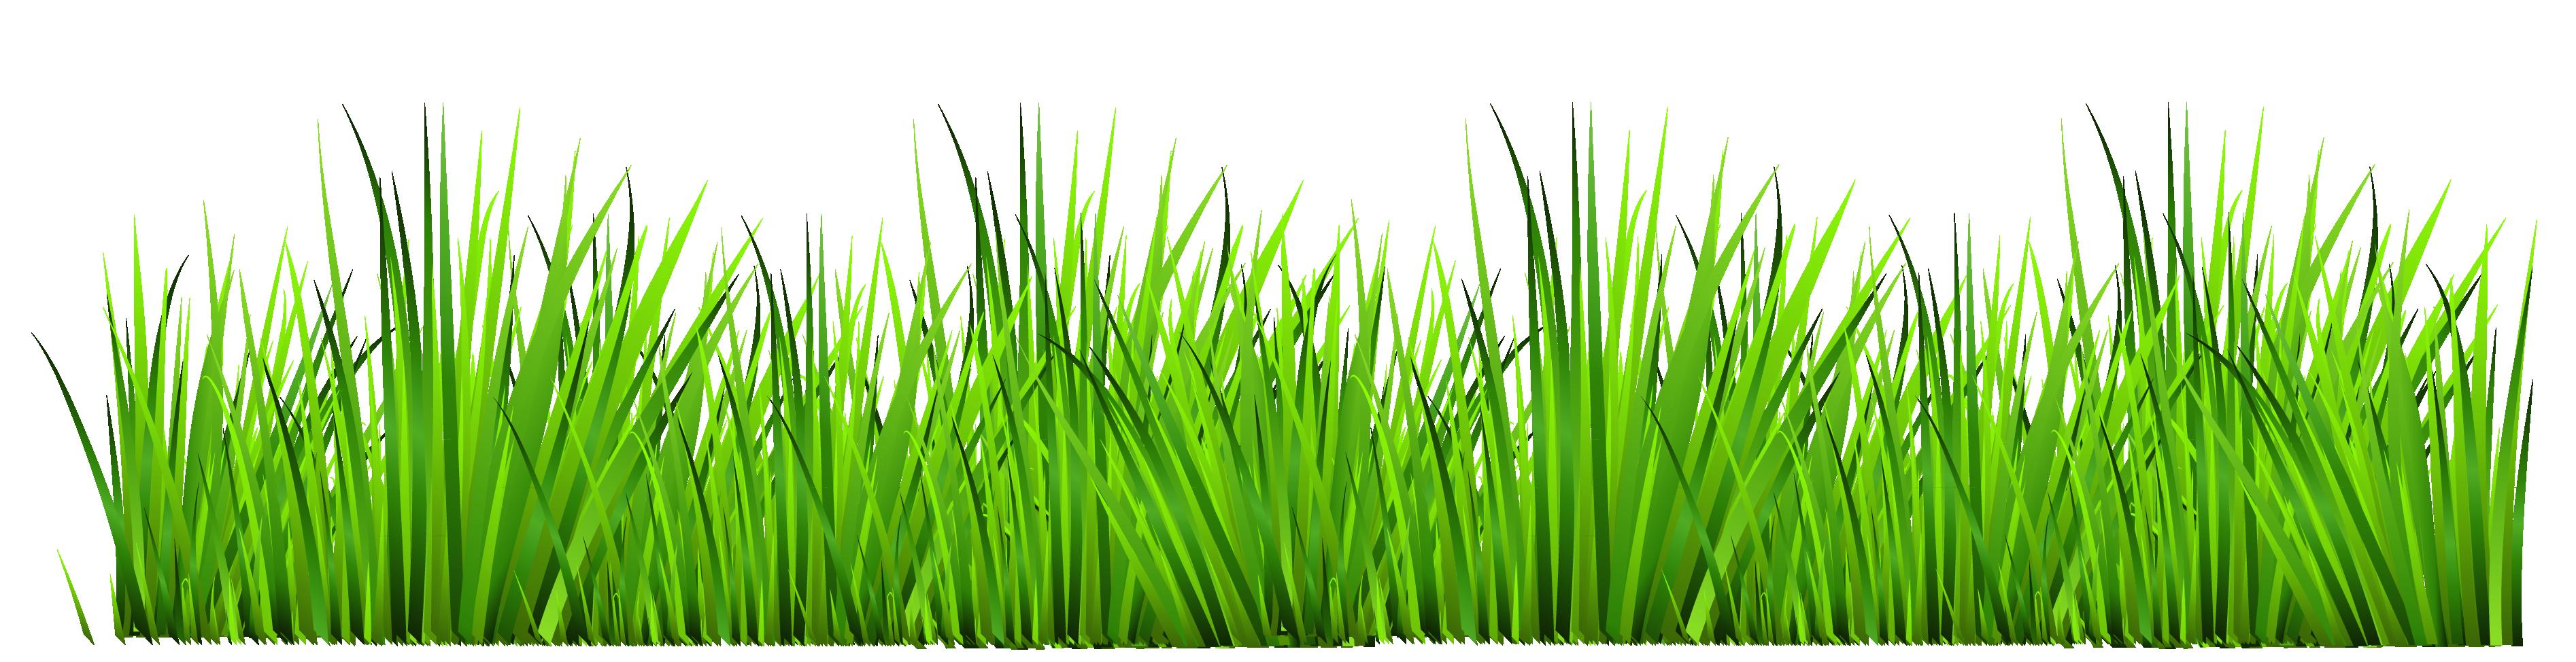 Green grass clipart freeuse stock Free Grass Cliparts, Download Free Clip Art, Free Clip Art on ... freeuse stock